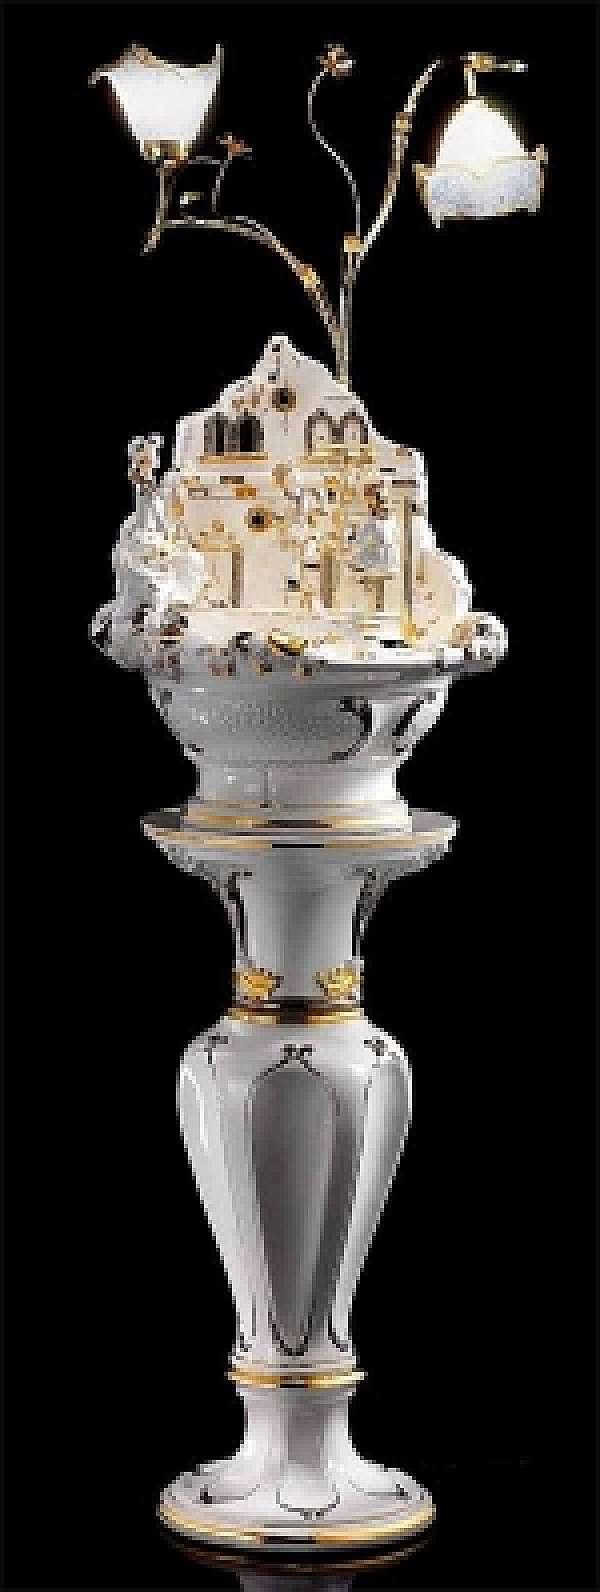 Напольная лампа LORENZON (F.LLI LORENZON) L.682/BOPLF ARTE E CERAMICA